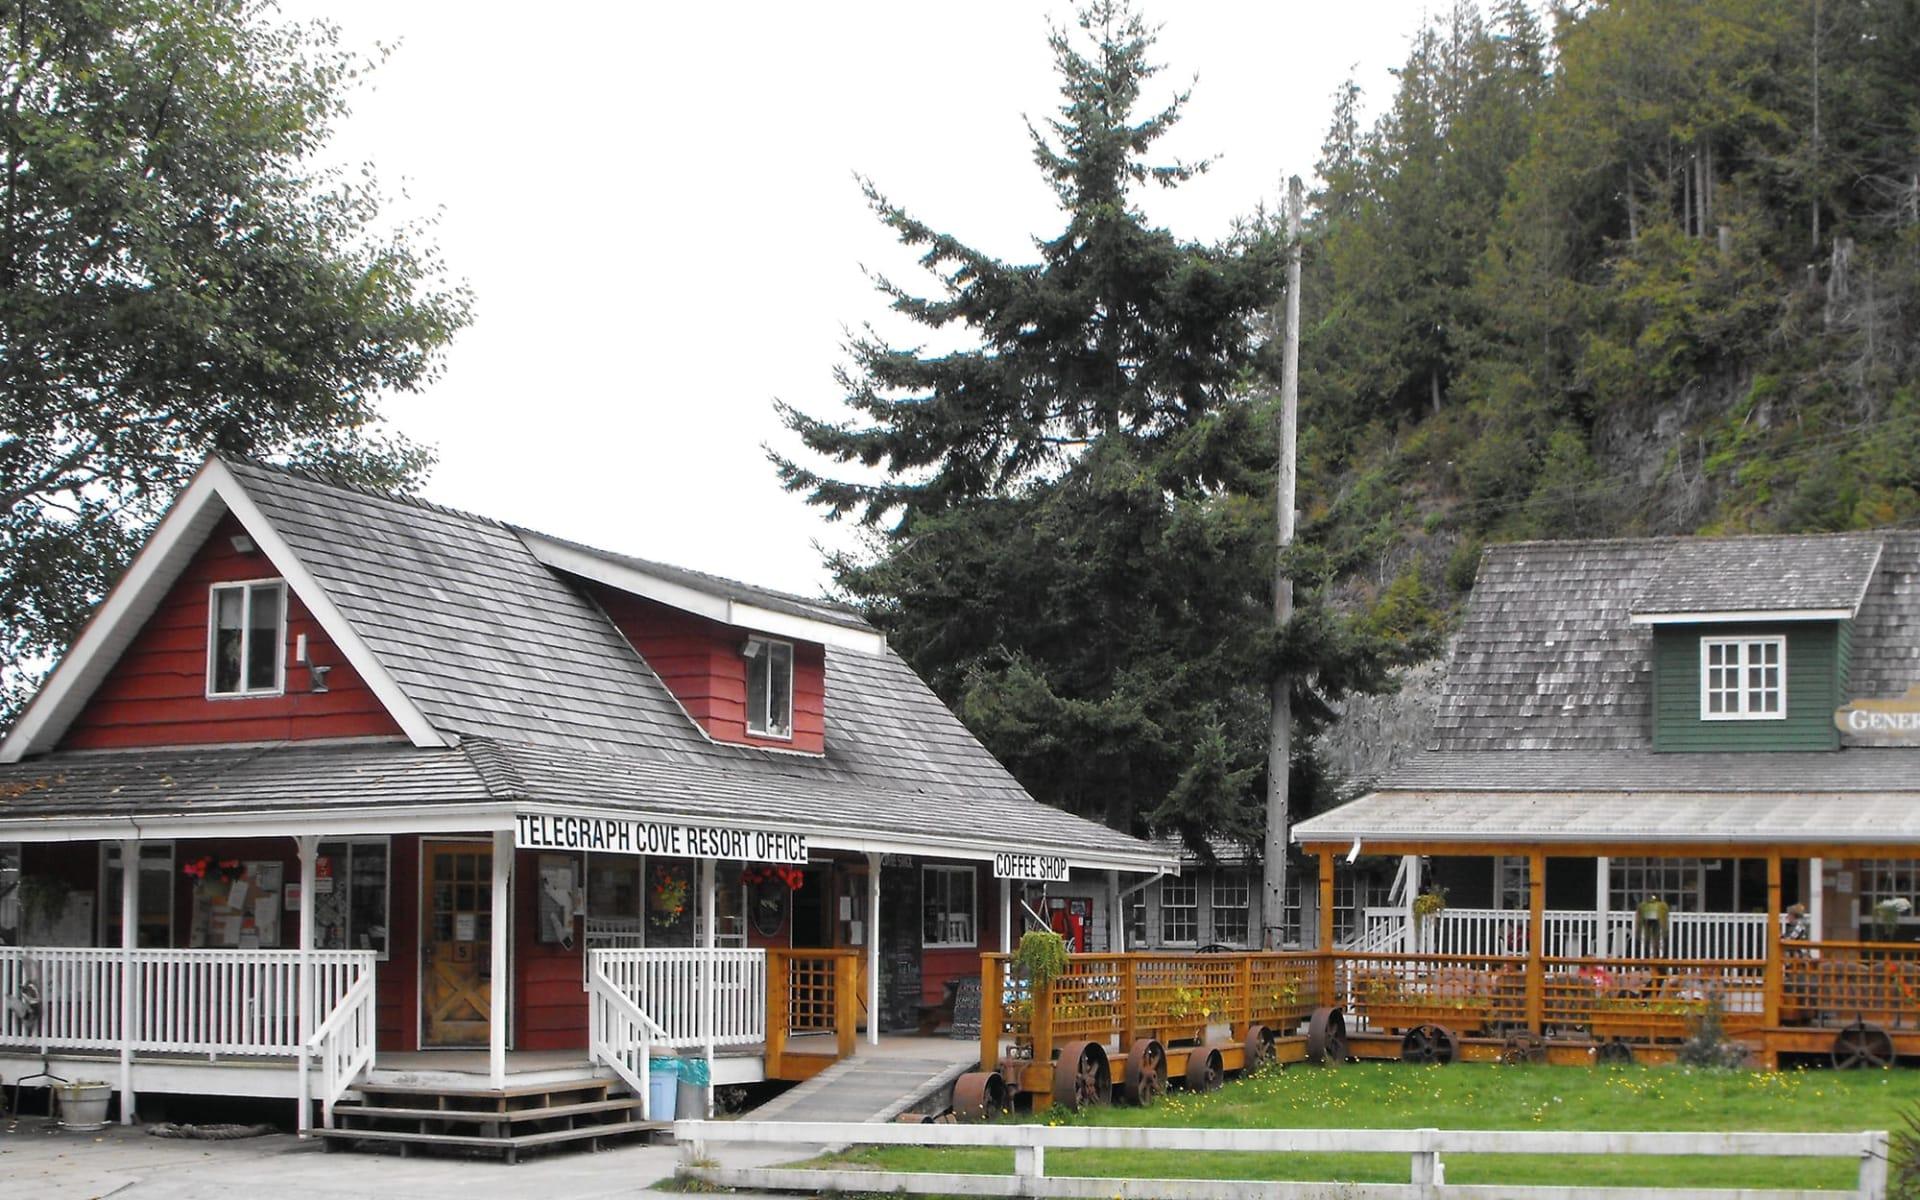 Telegraph Cove Resort:  Telegraph Cove Resort